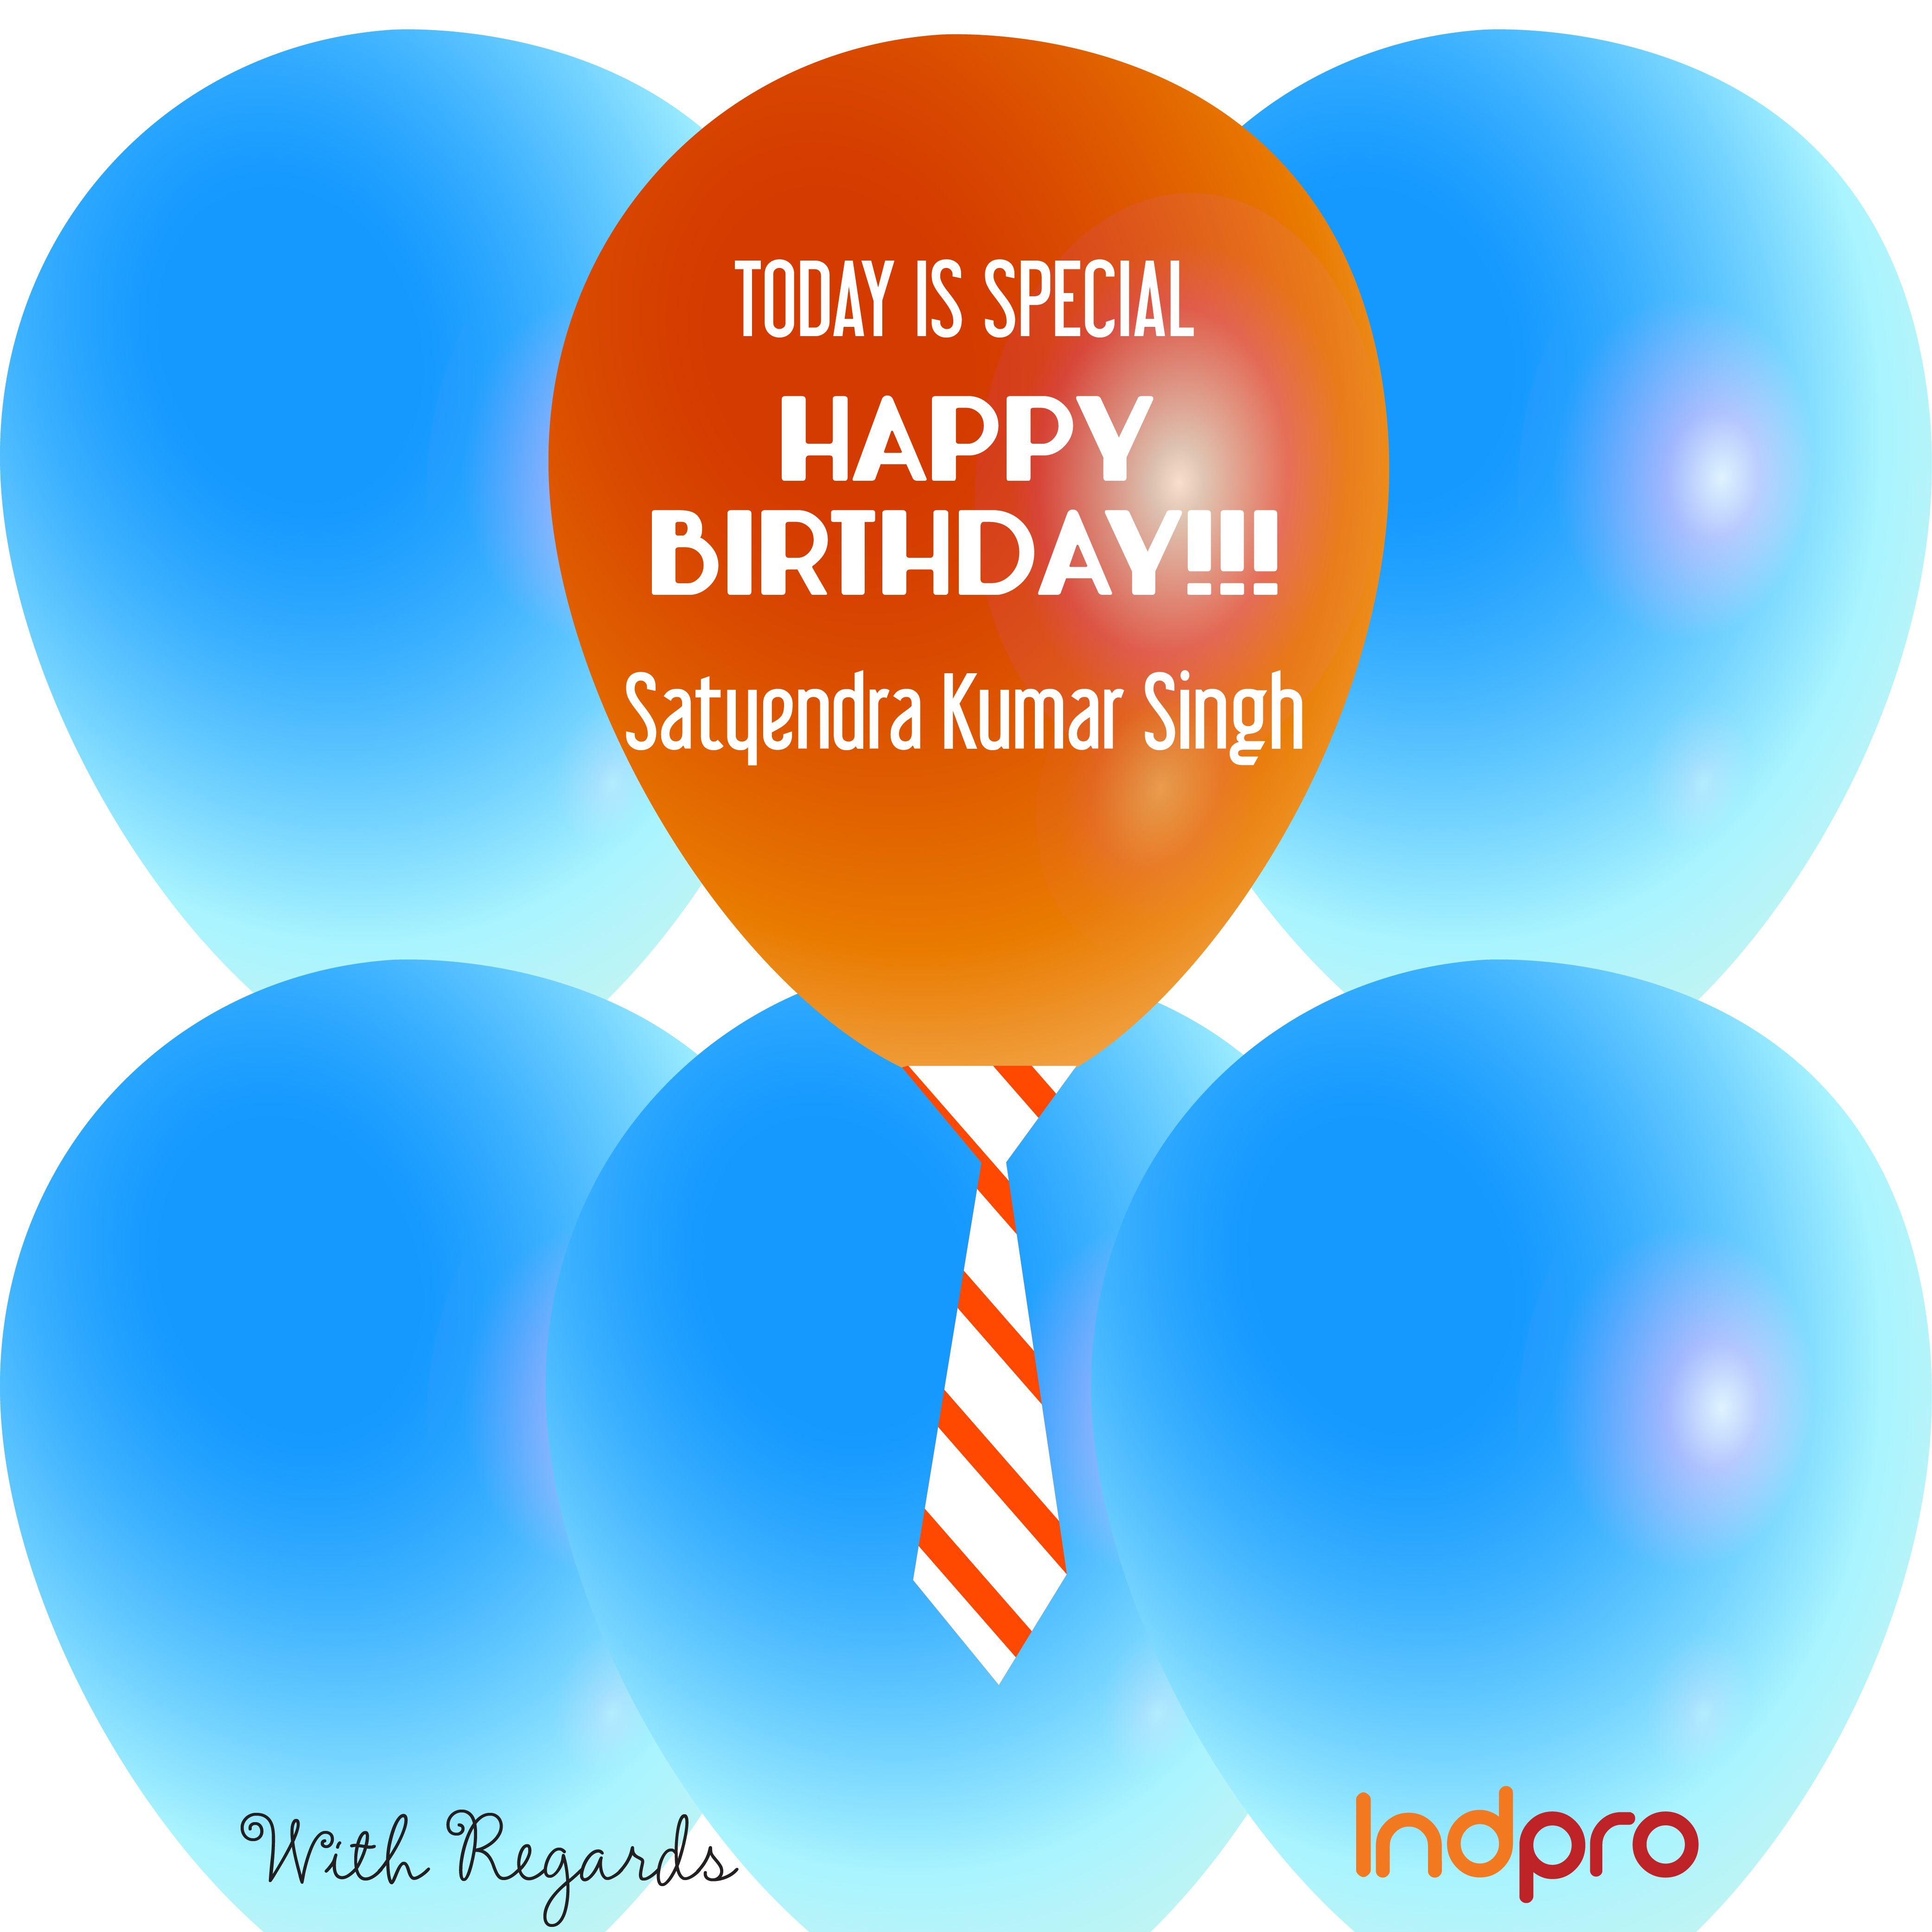 #BdayCards #Happybirthday #Indpro  www.indpro.se